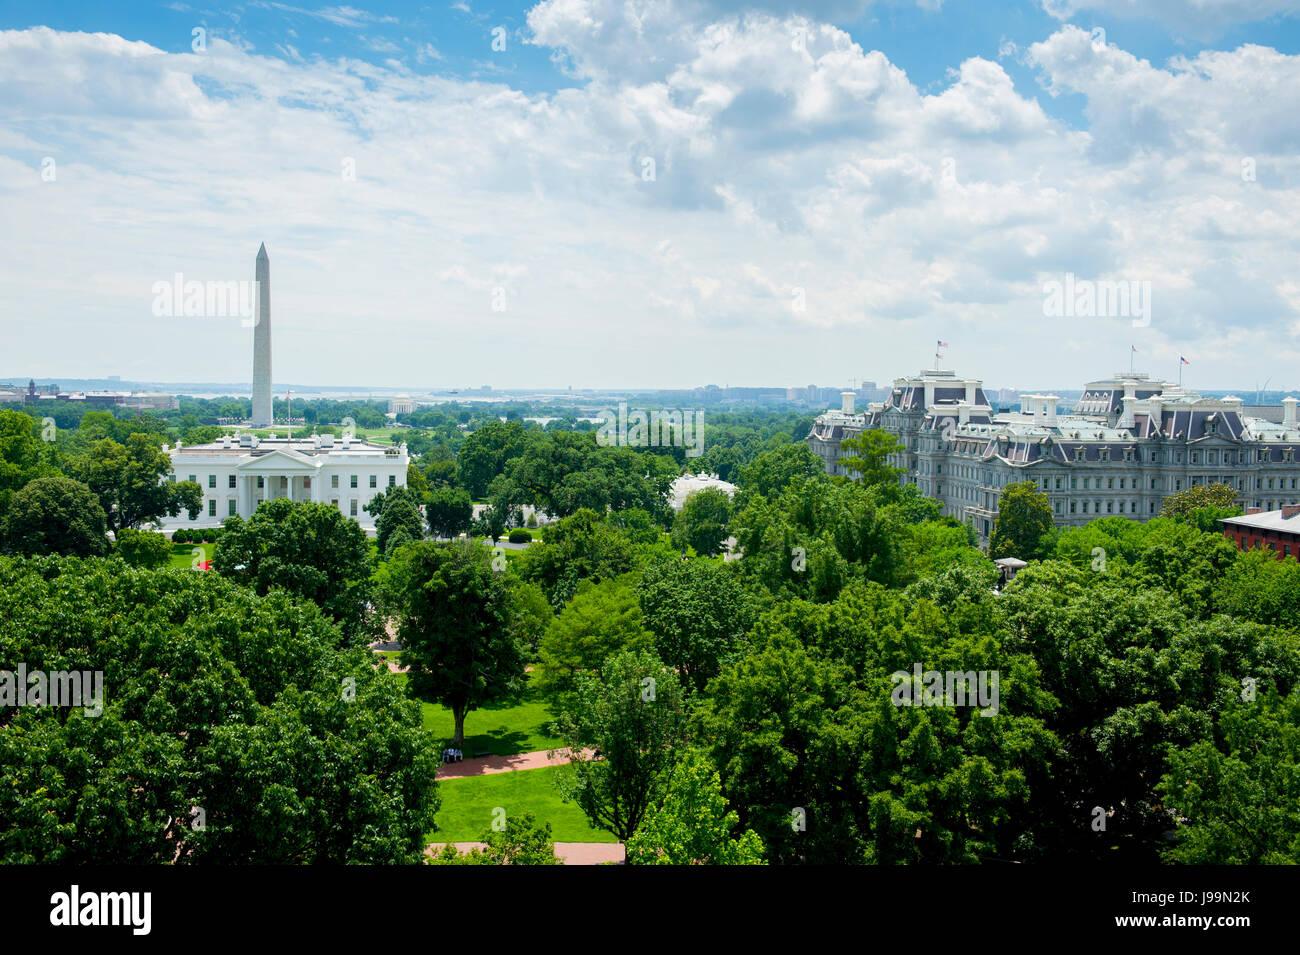 usa-washington-dc-nations-capitol-white-